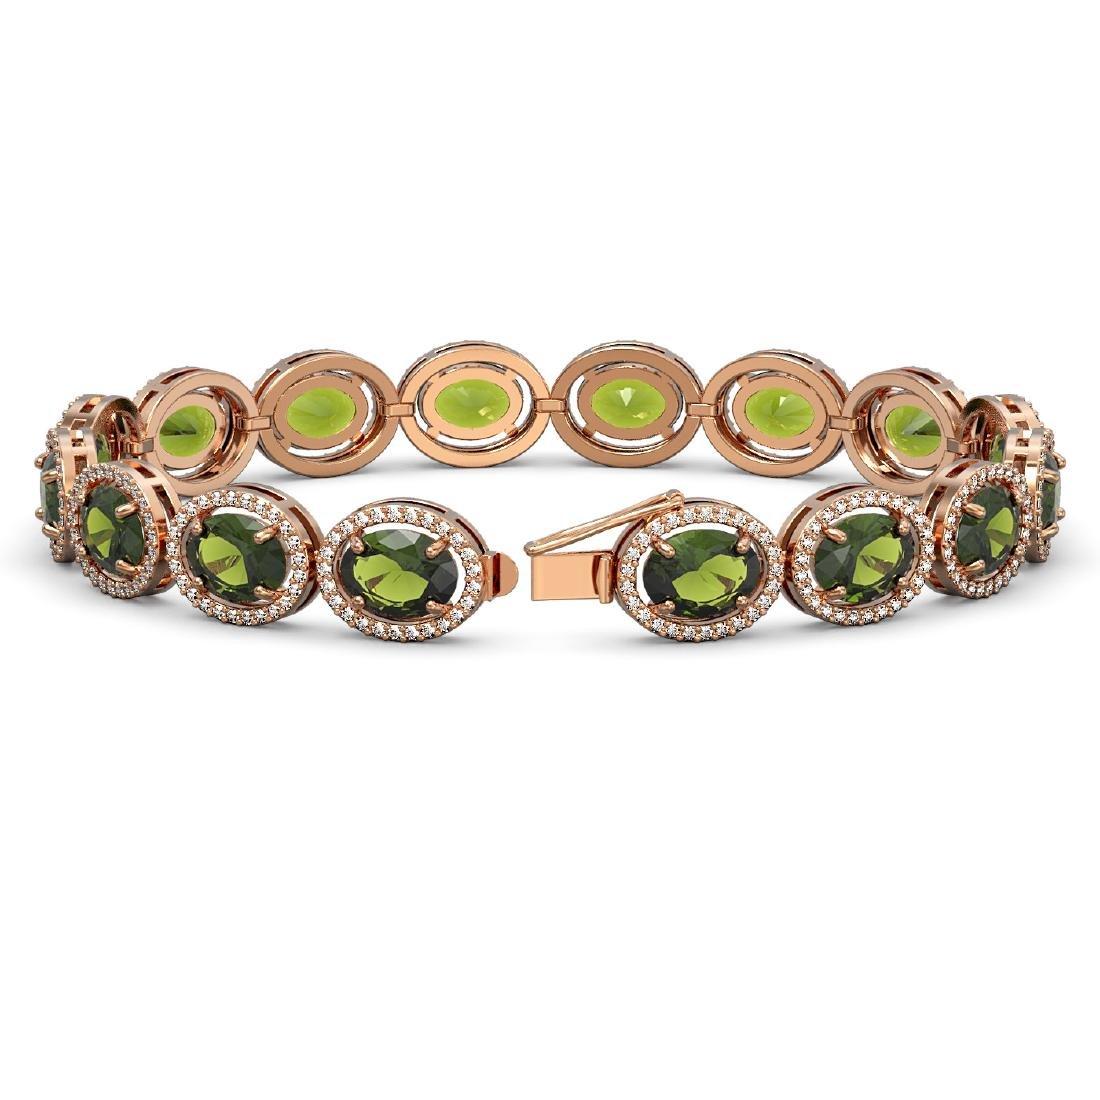 23.6 CTW Tourmaline & Diamond Halo Bracelet 10K Rose - 2